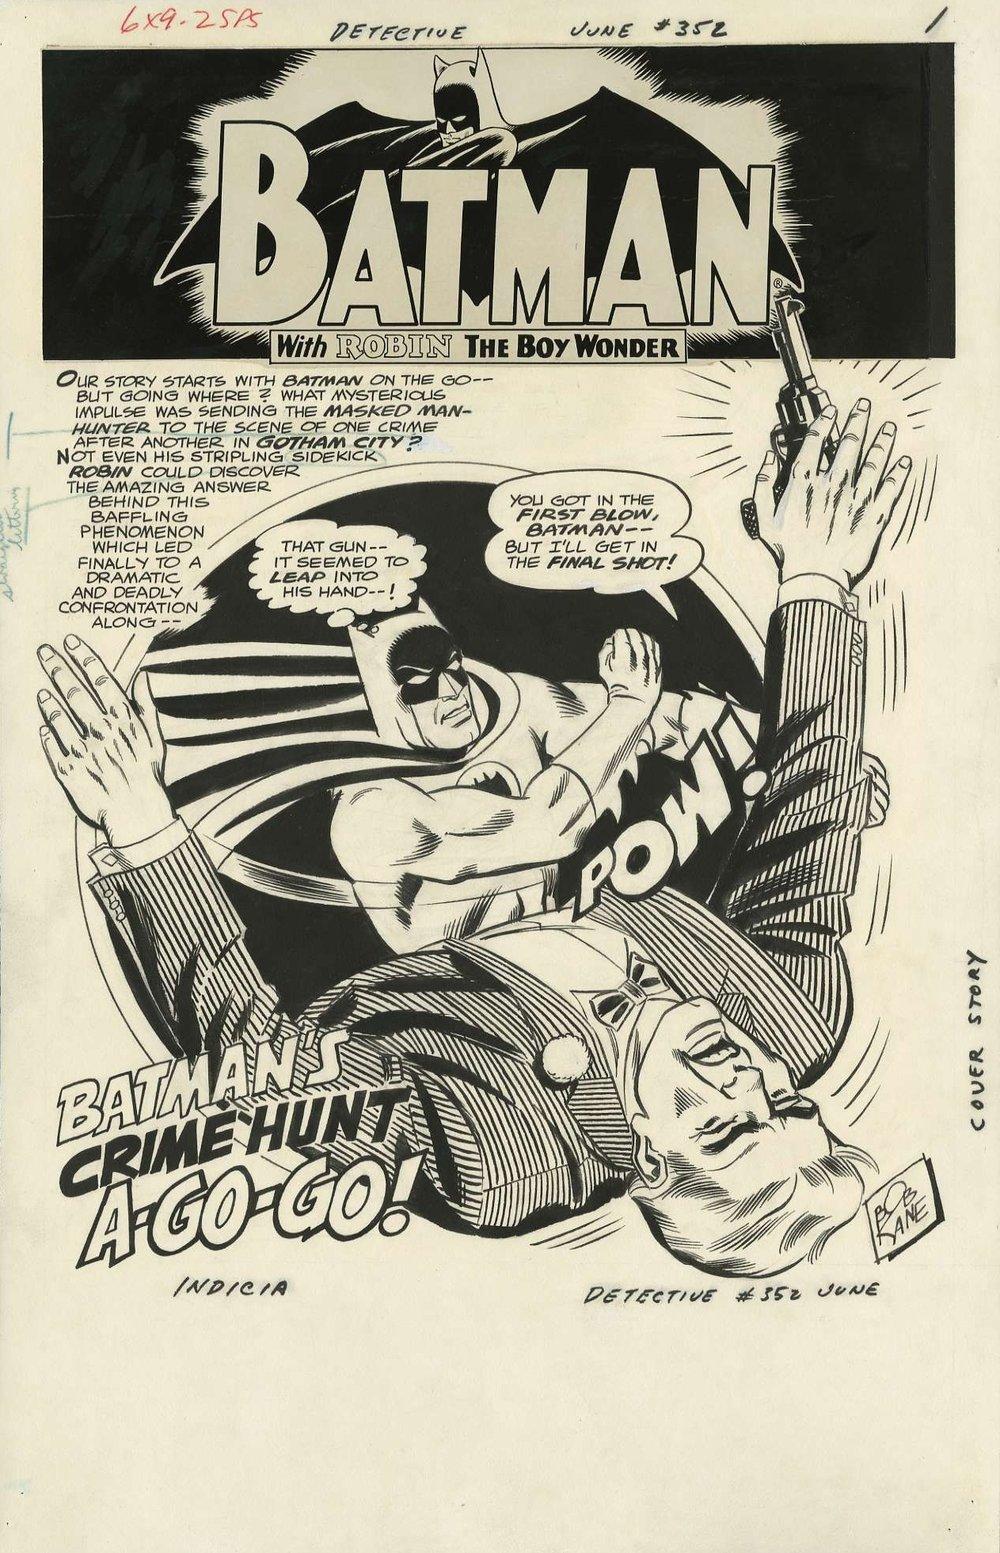 Detective Comics #352 splash page original art by Sheldon Moldoff.